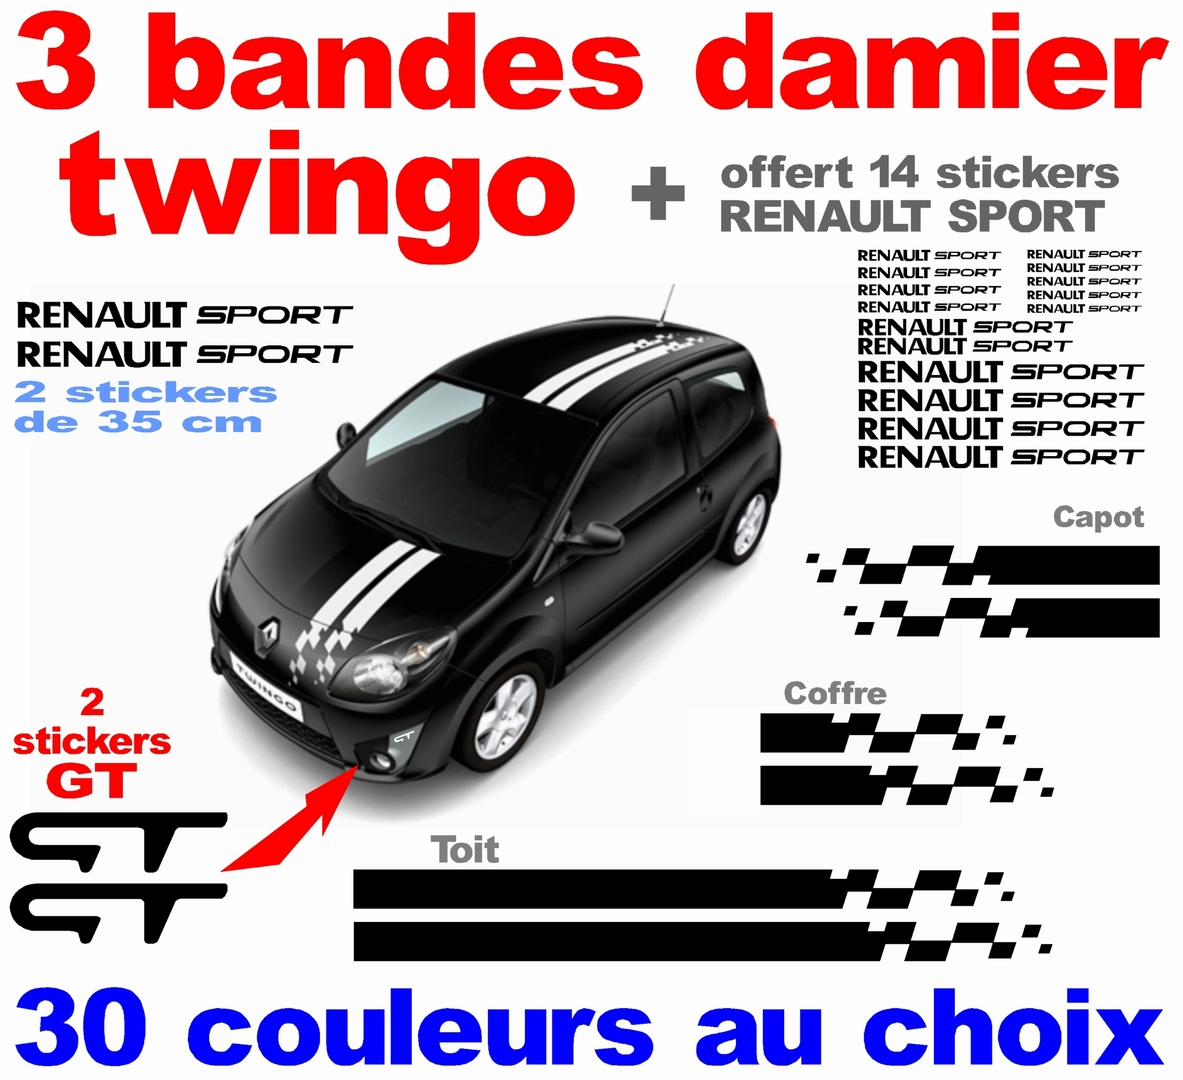 stickers-ref134a-bande-damier-twingo-gt-cadeaux-renault-sport-tuning-rallye-megane-clio4-c4-scenic-compétision-deco-adhesive-autocollant